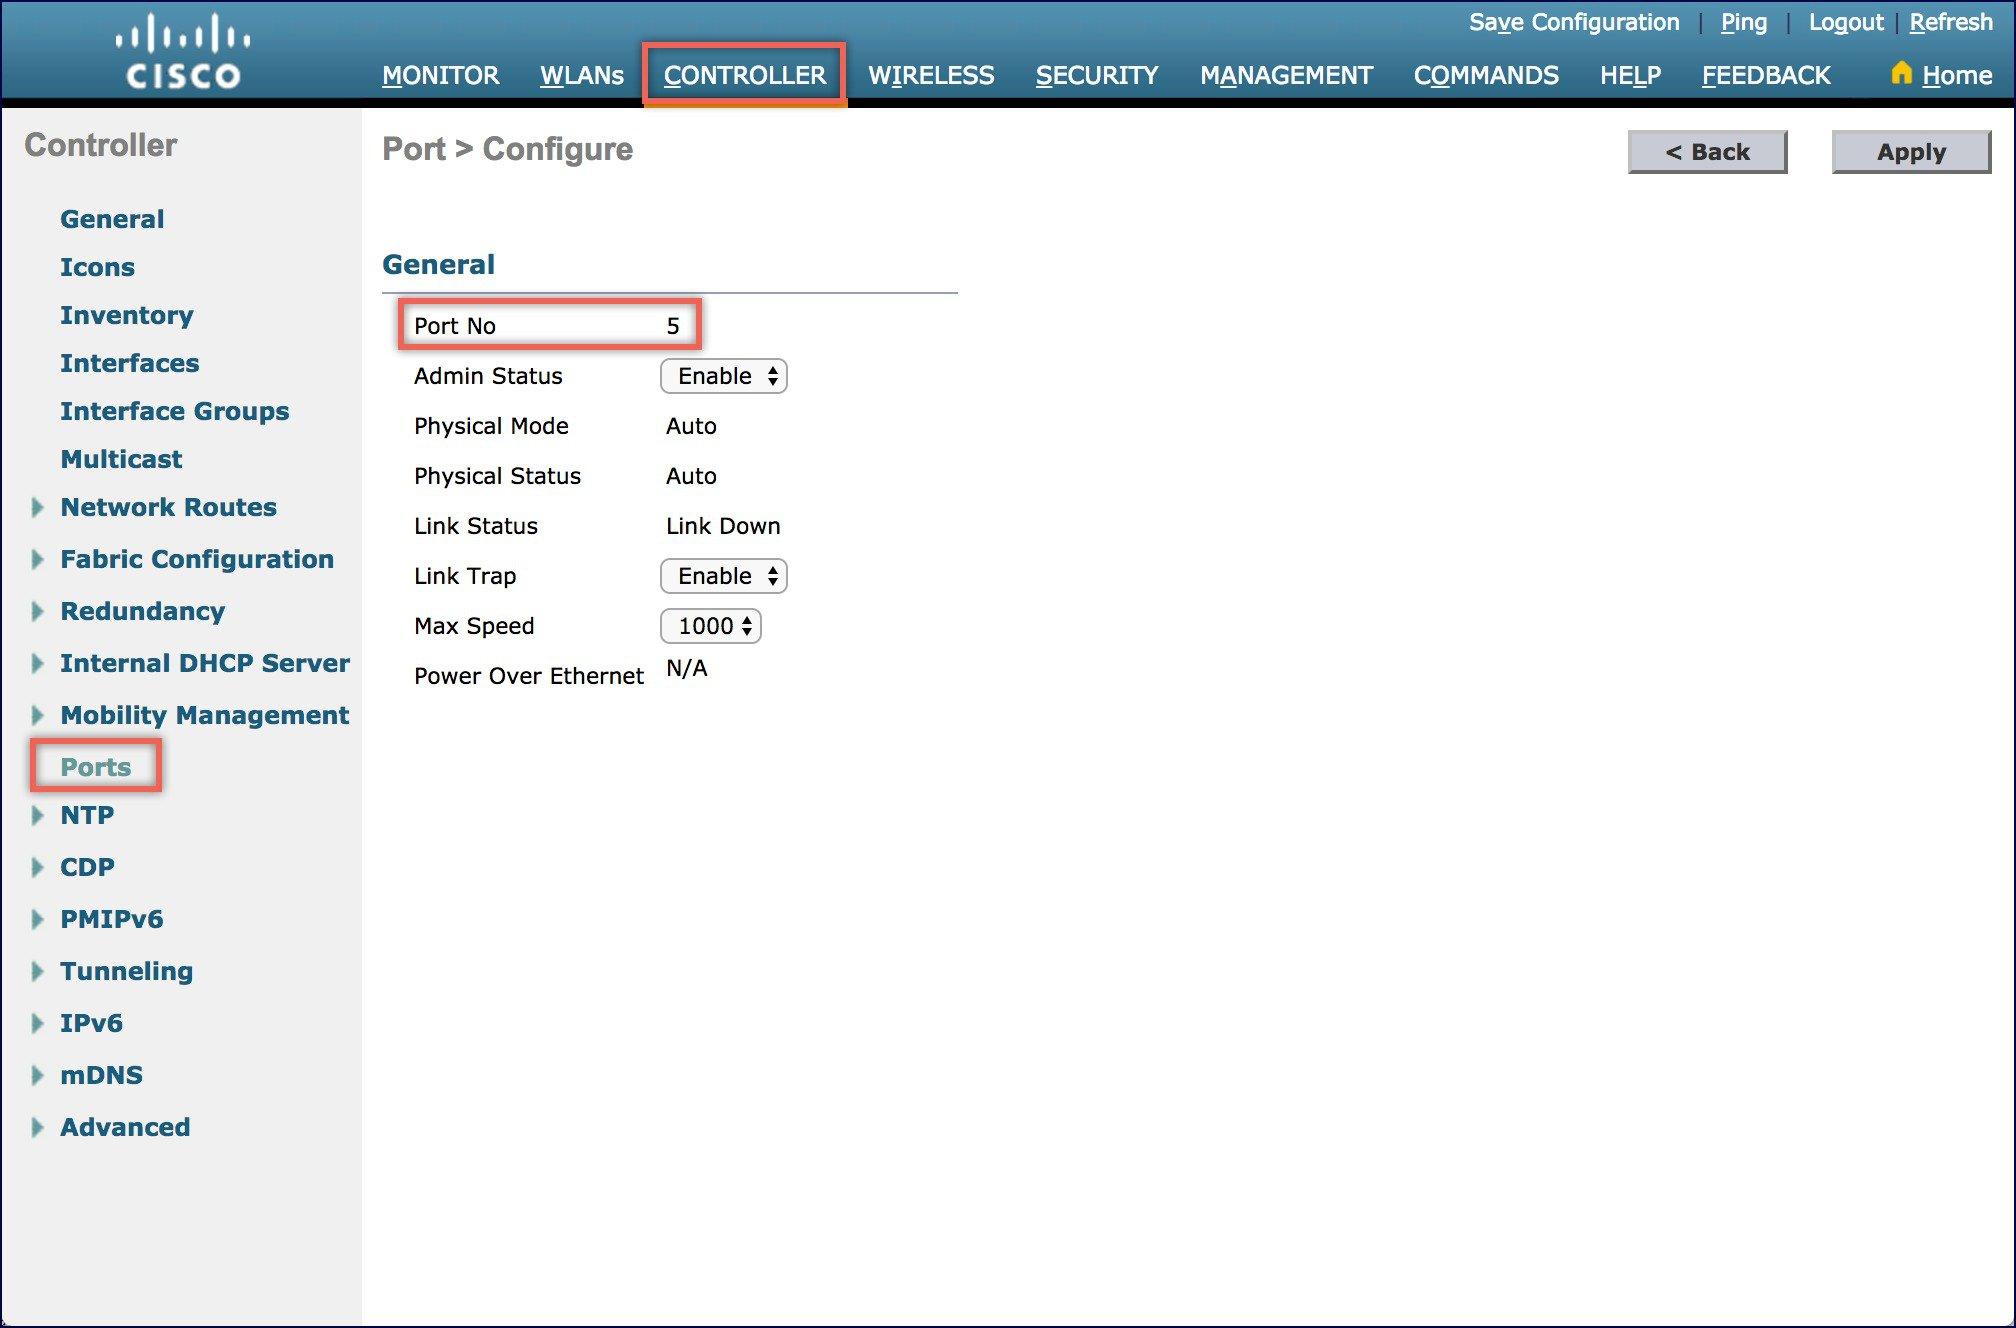 WLC 3504 Release 8 5 Deployment Guide - Cisco